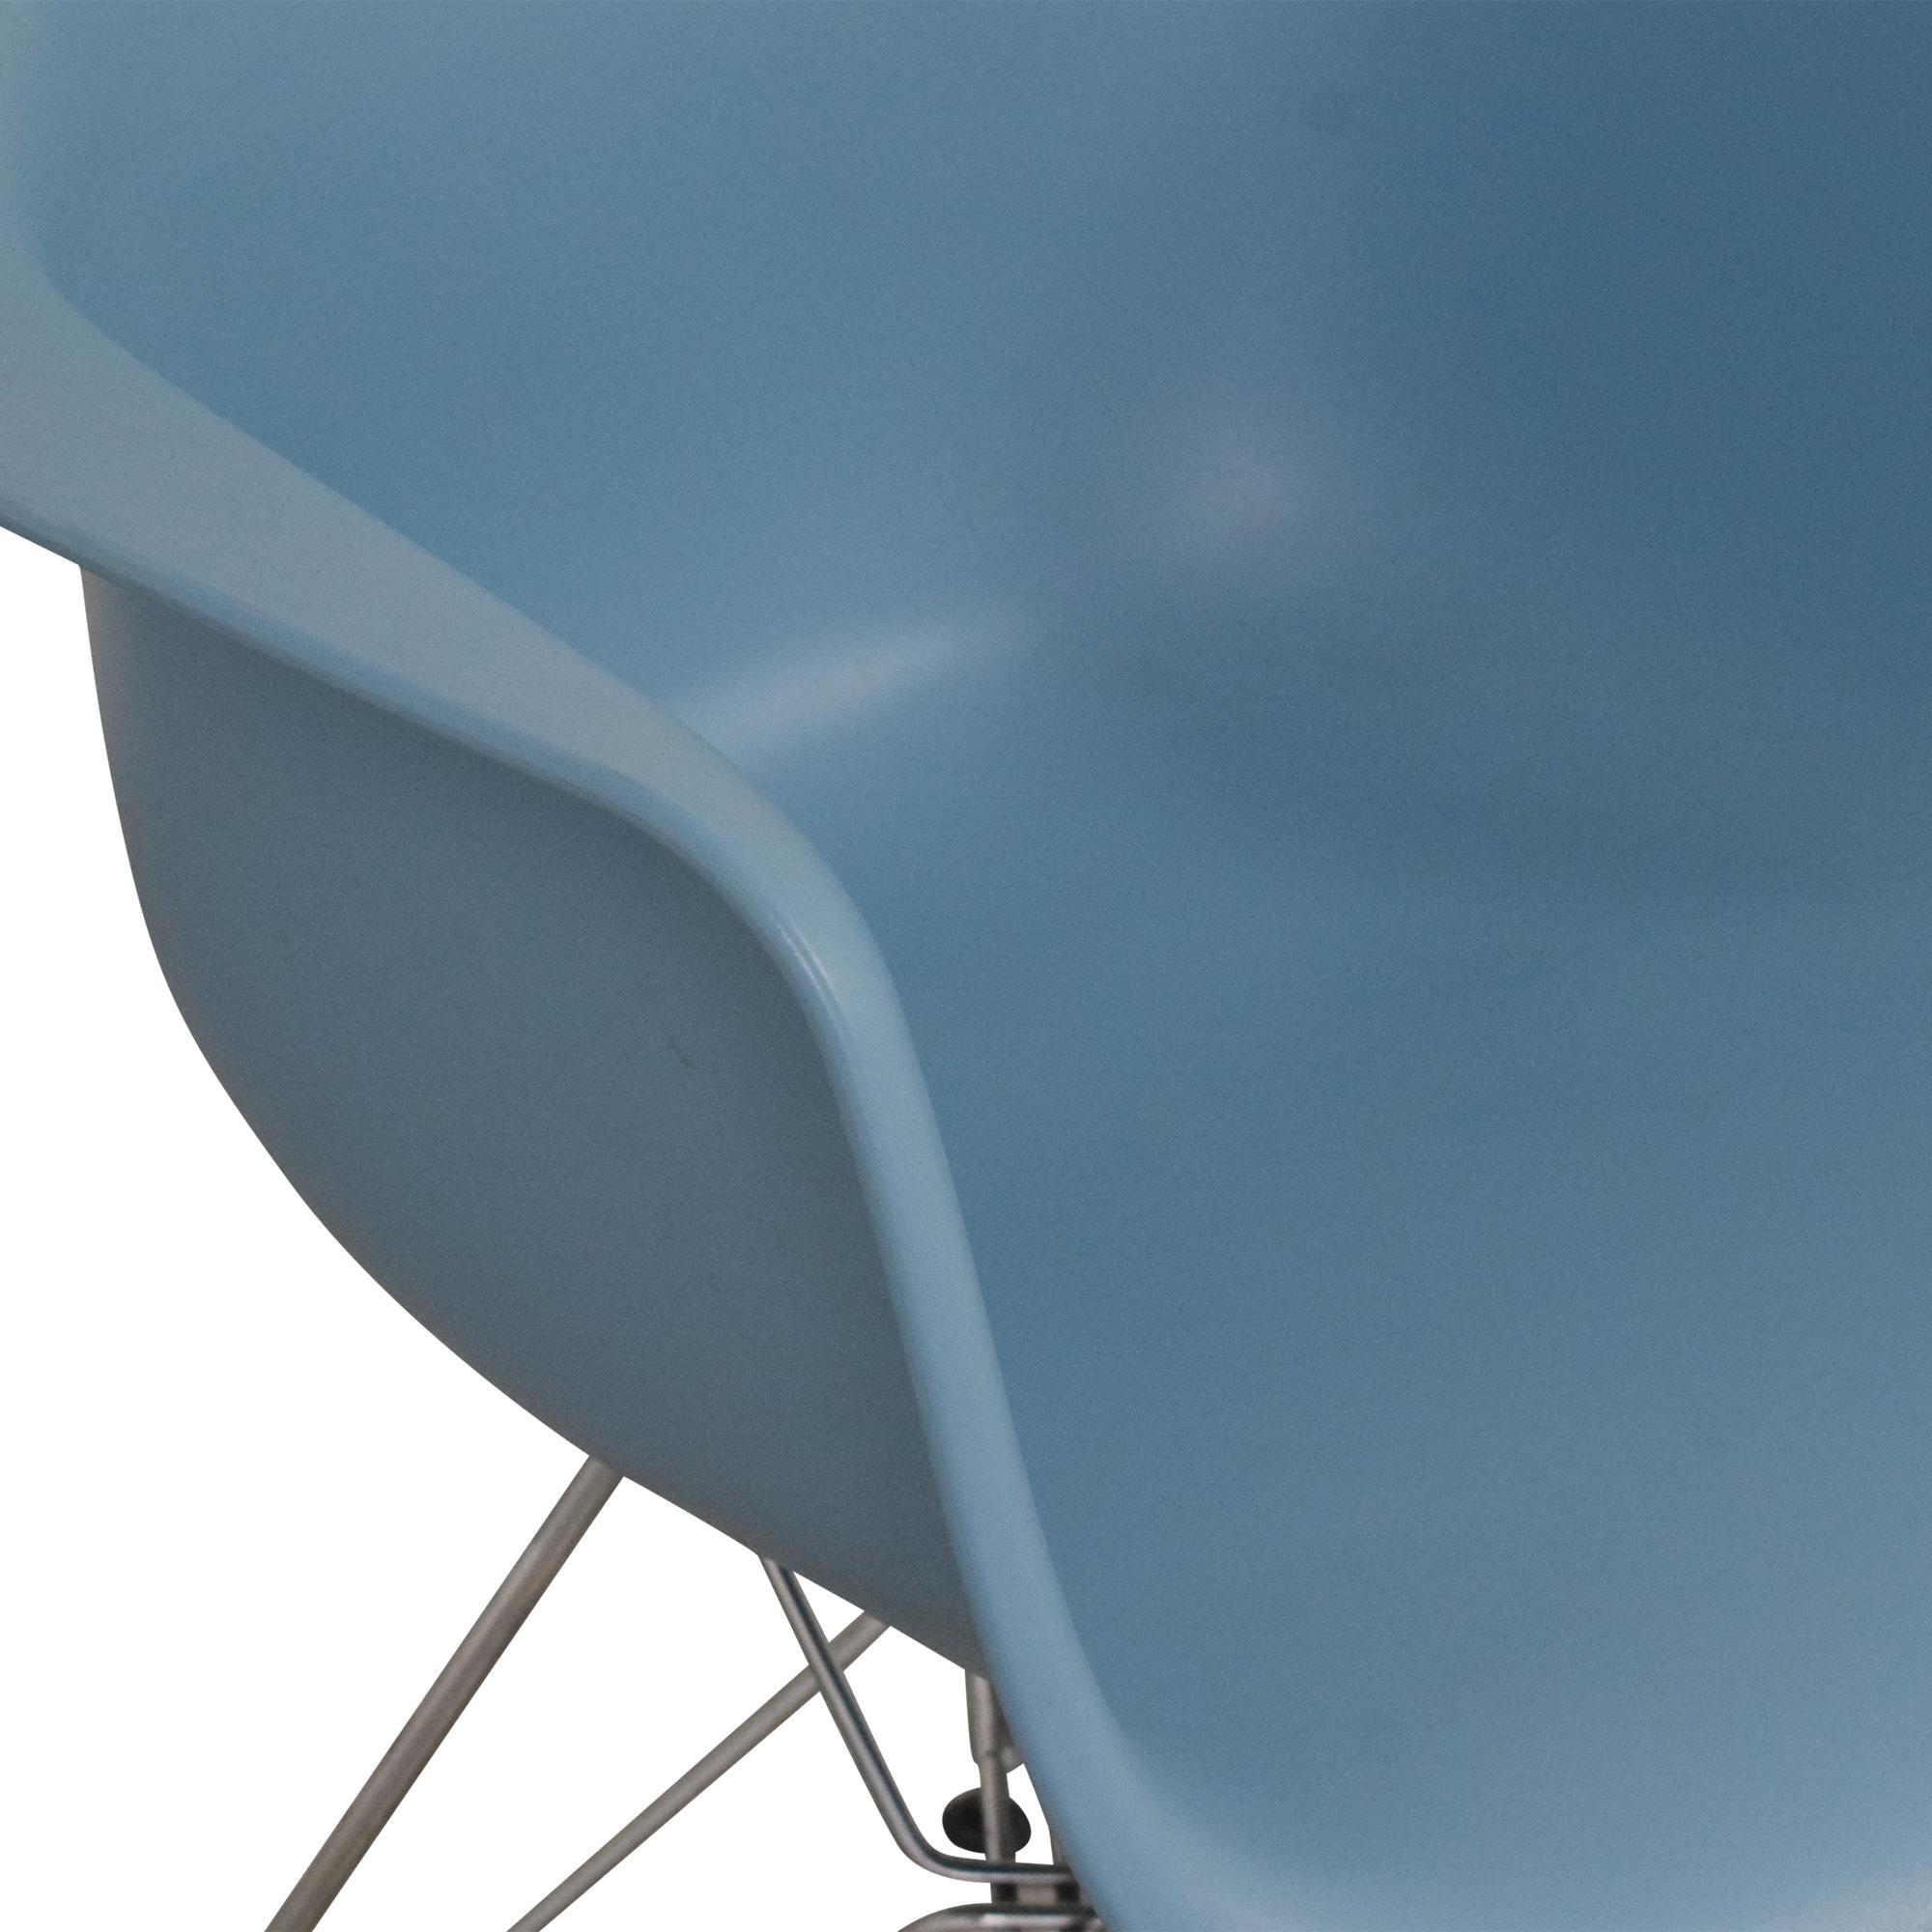 Herman Miller Herman Miller Eames Molded Armchairs nyc